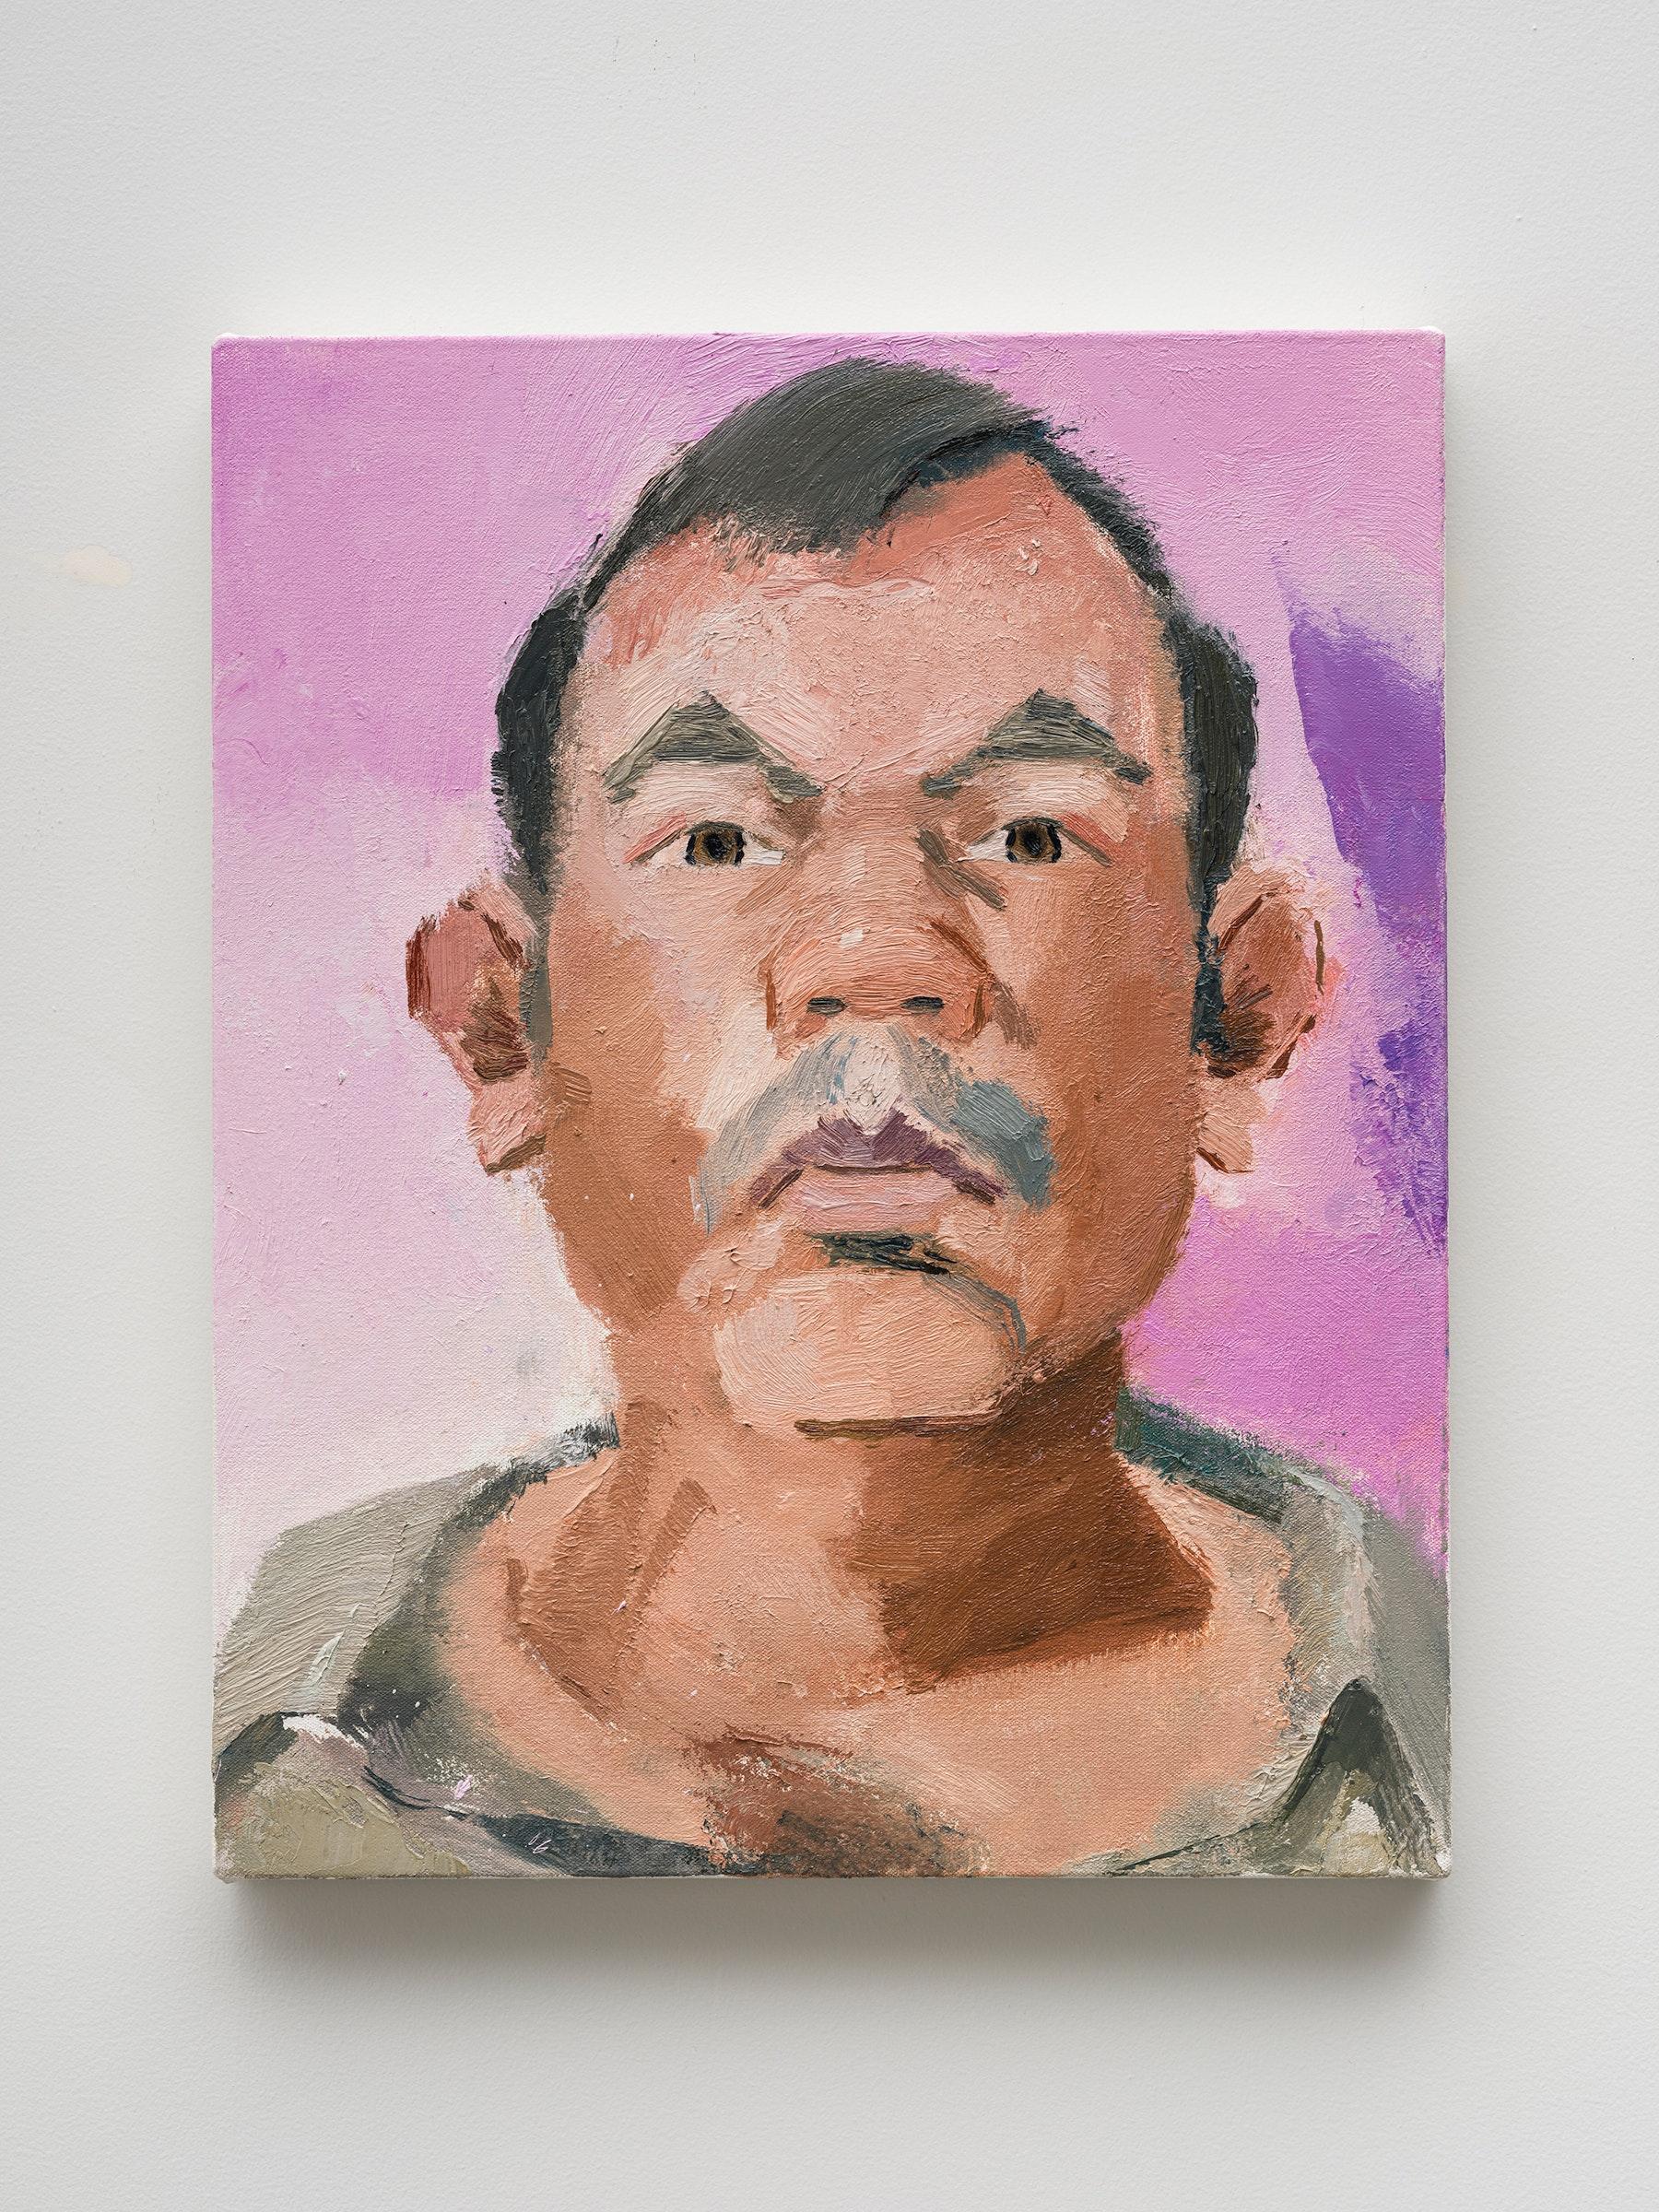 "John Sonsini ""Gabriel,"" 2021 Oil on canvas 20"" x 16"" [HxW] (50.8 x 40.64 cm) Inventory #SON127 Courtesy of the artist and Vielmetter Los Angeles Photo credit: Jeff Mclane"